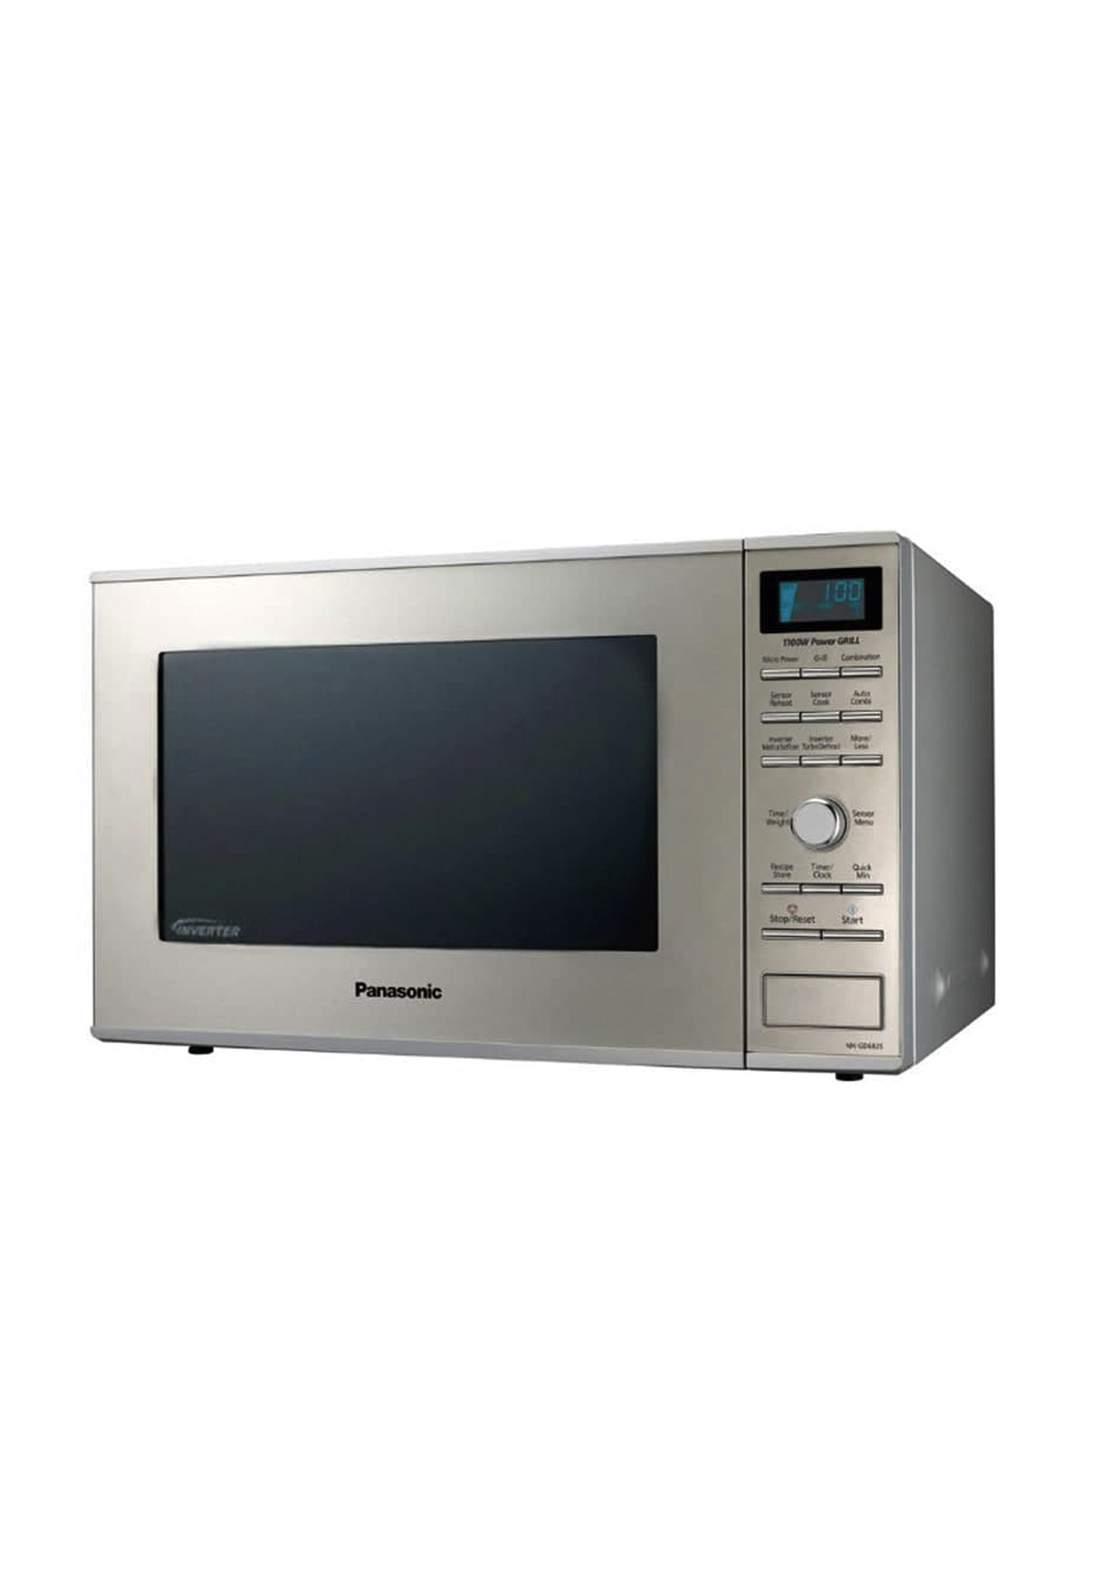 Panasonic-NN-GD692SPTE Grill Microwave Oven, Inverter 31L مايكرويف